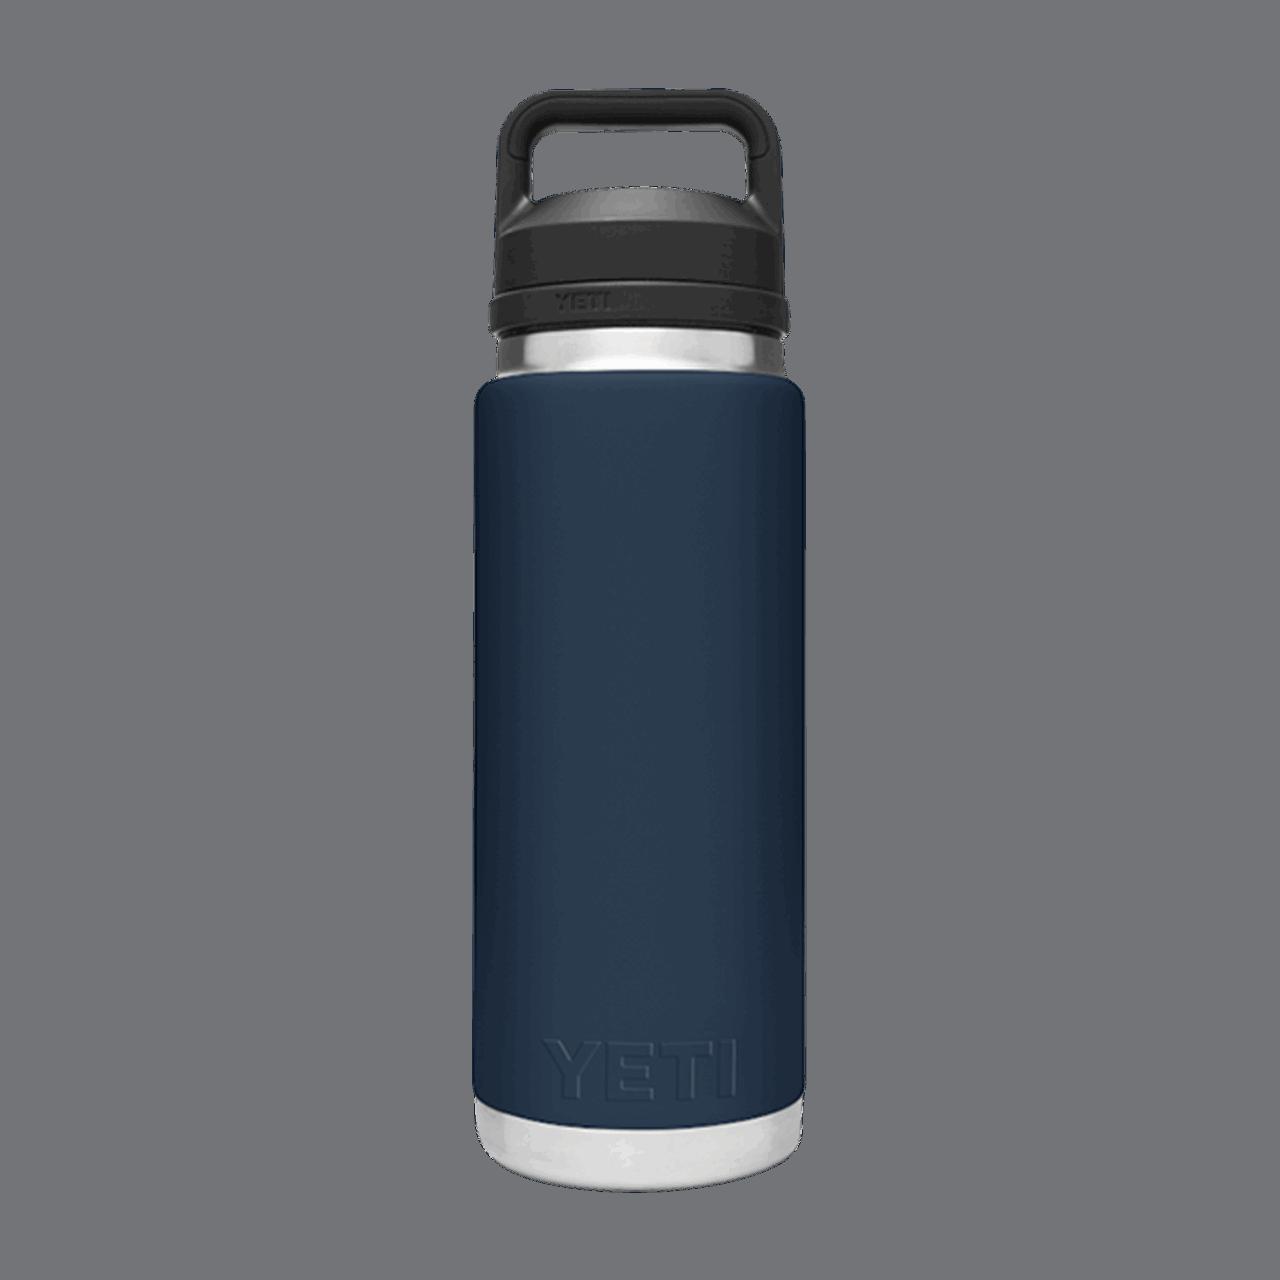 YETI Rambler 26 oz Flasche - navy